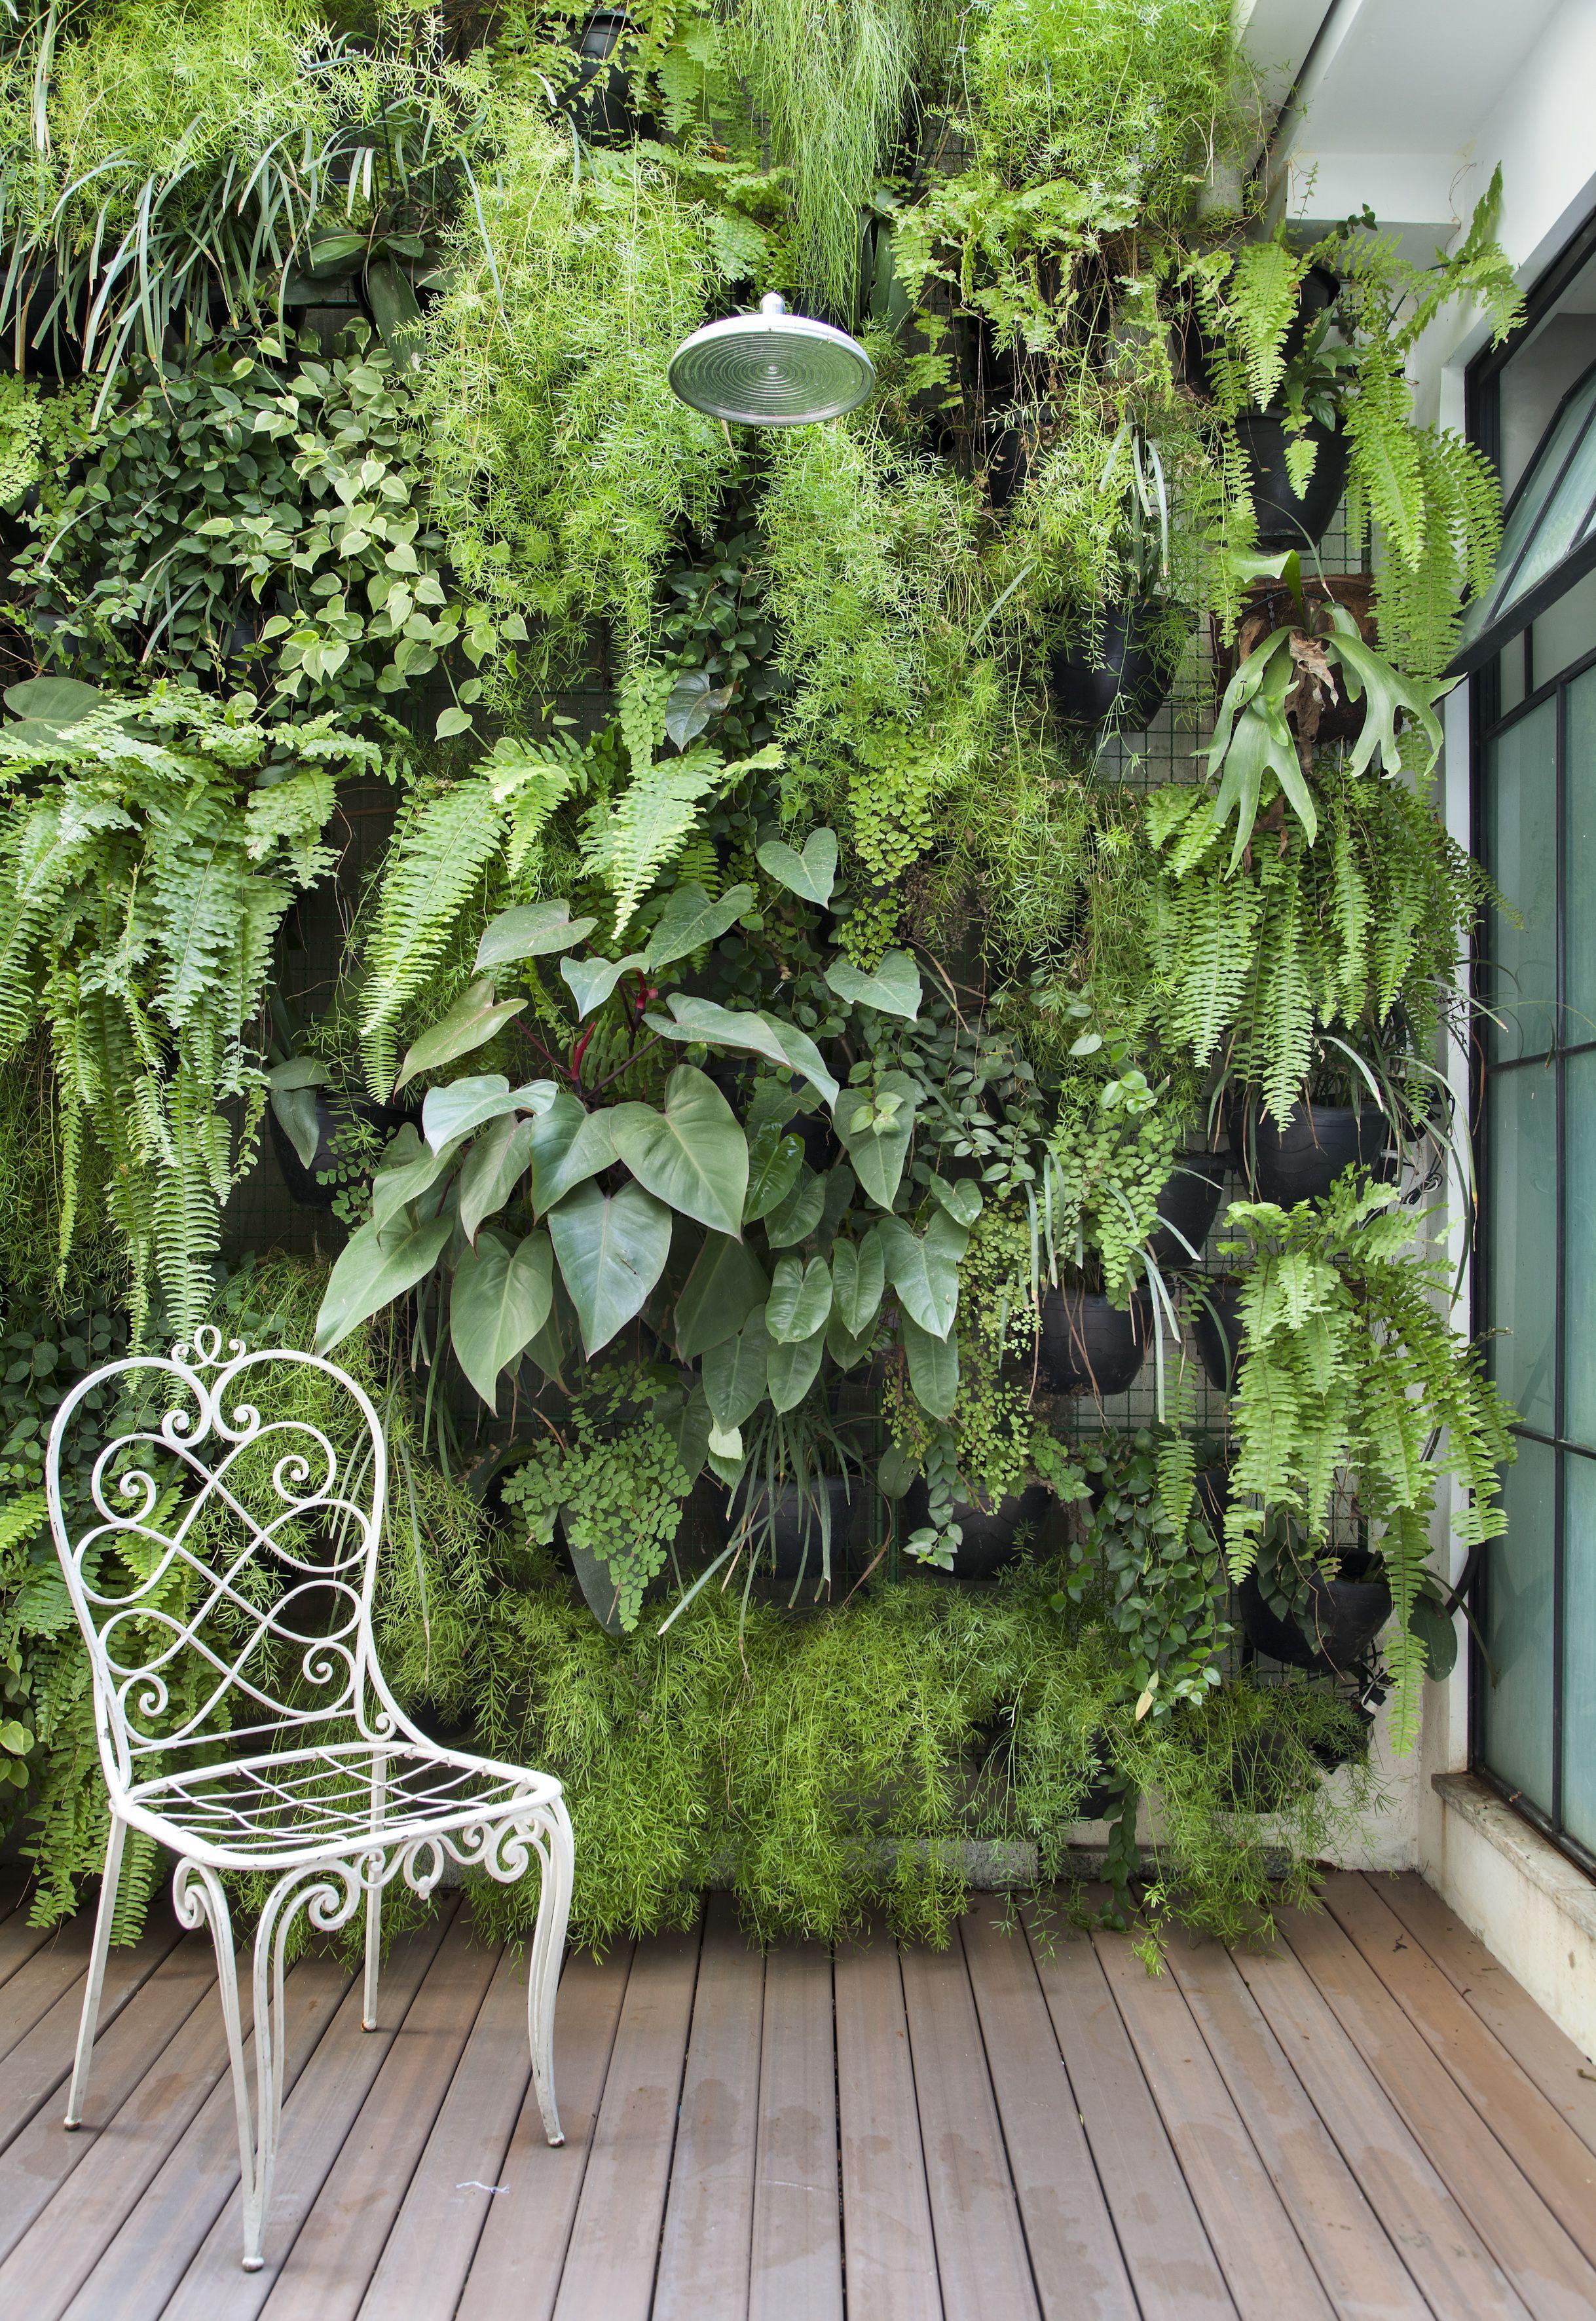 How to Make a Zen Garden | Greenery, LUSH and Gardens